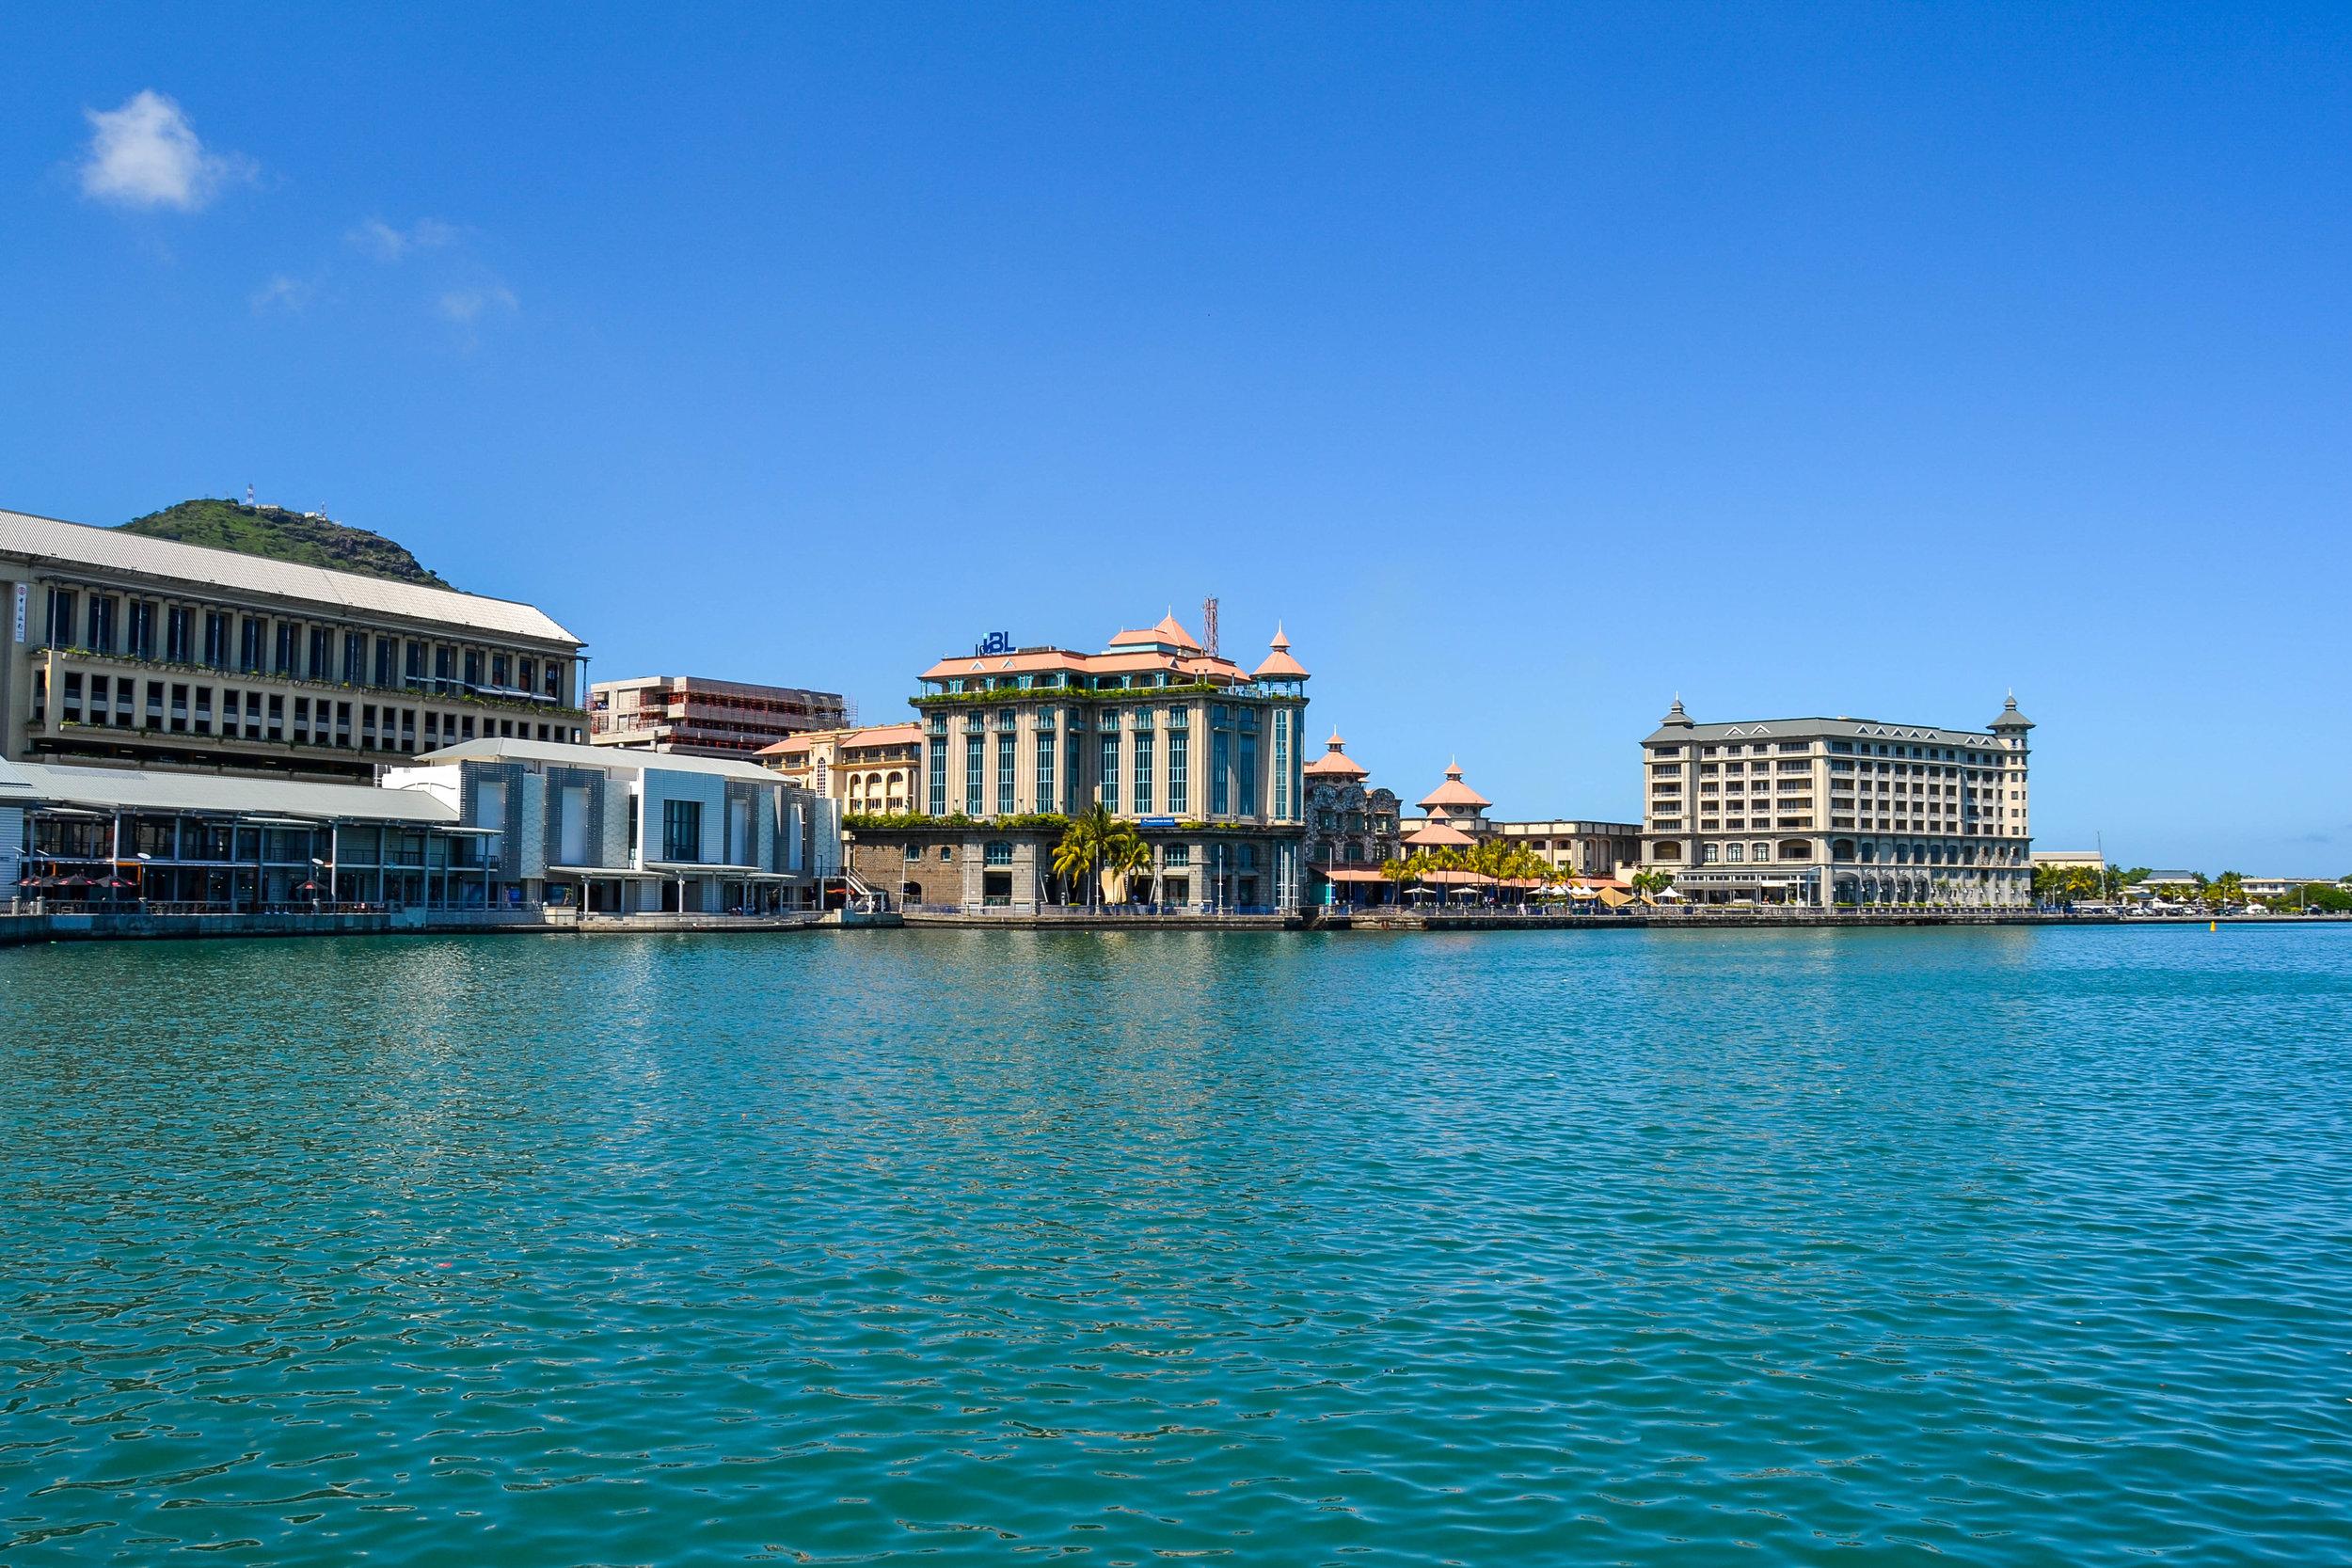 Le Caudan Waterfront in Port Louis